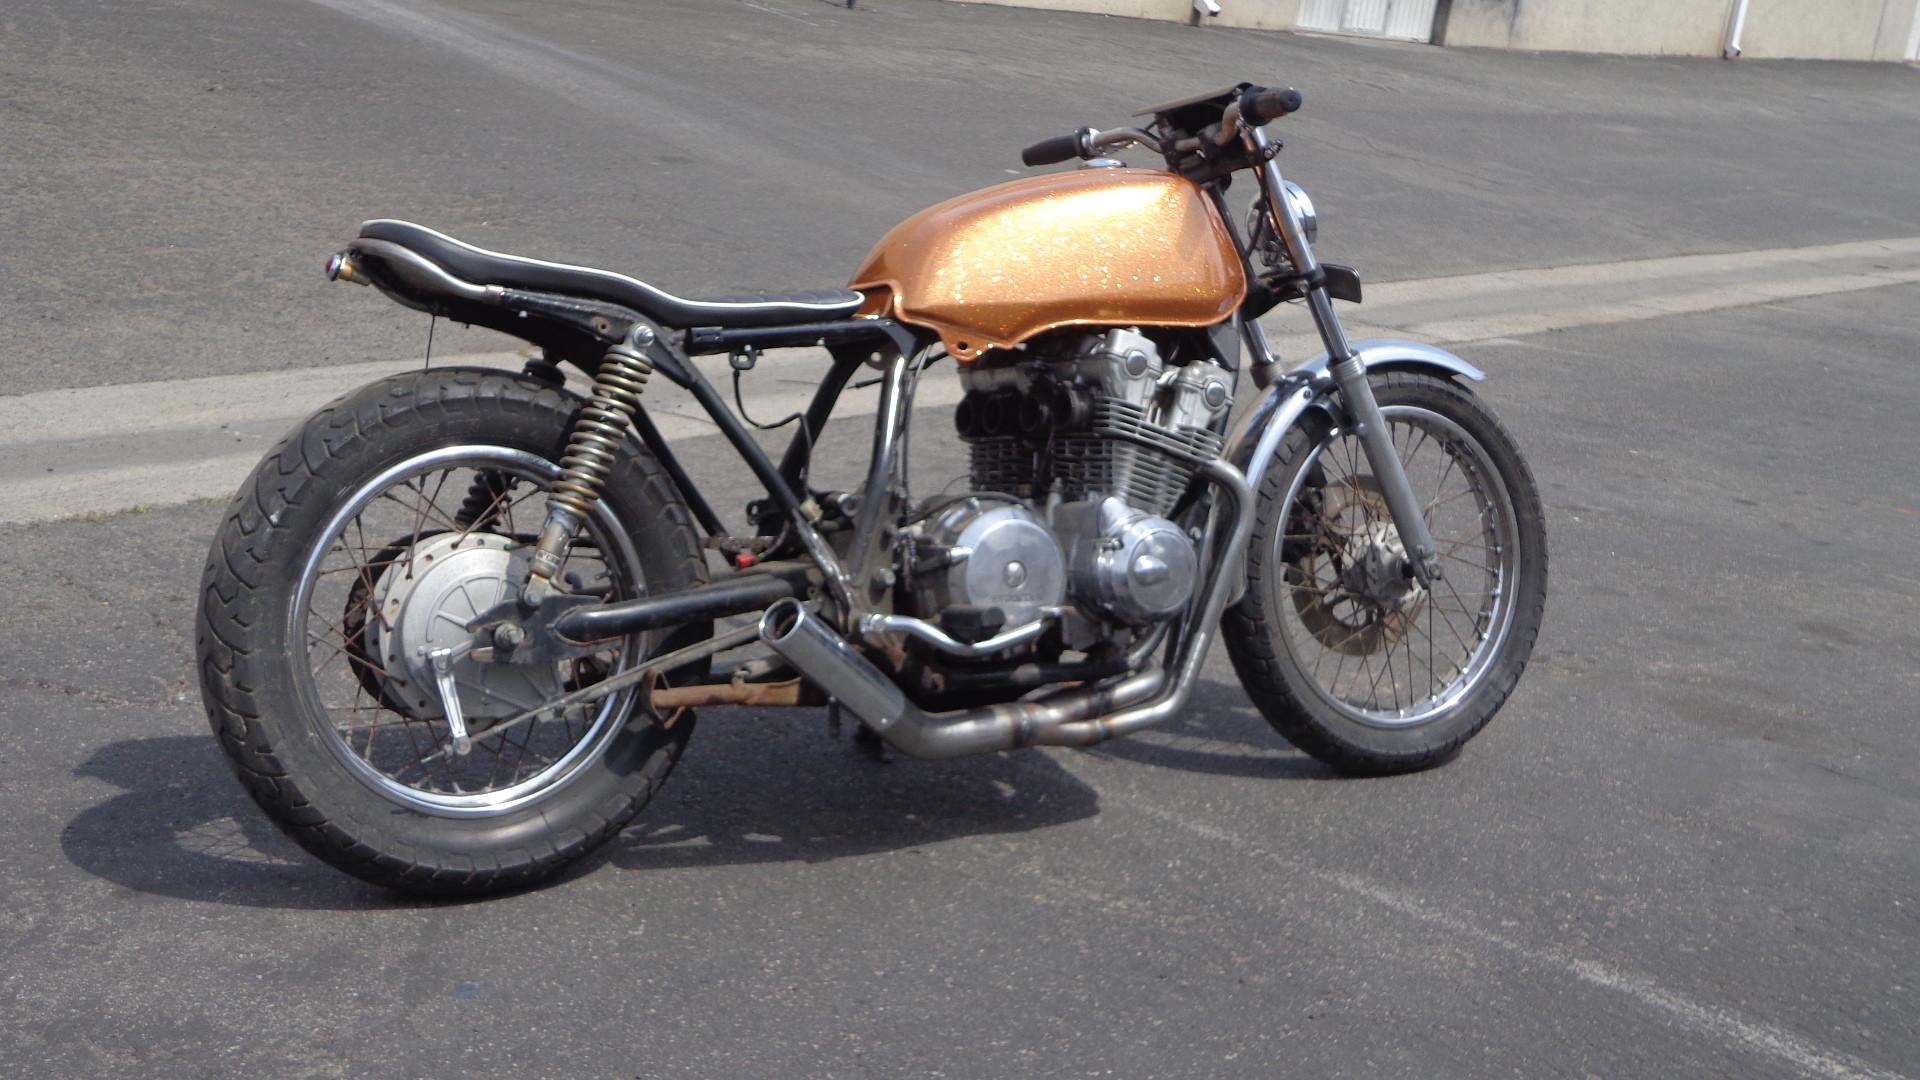 Honda Cb500t Cafe Racer Wallpaper 4 Jpg 1920 1080 Motorcycles